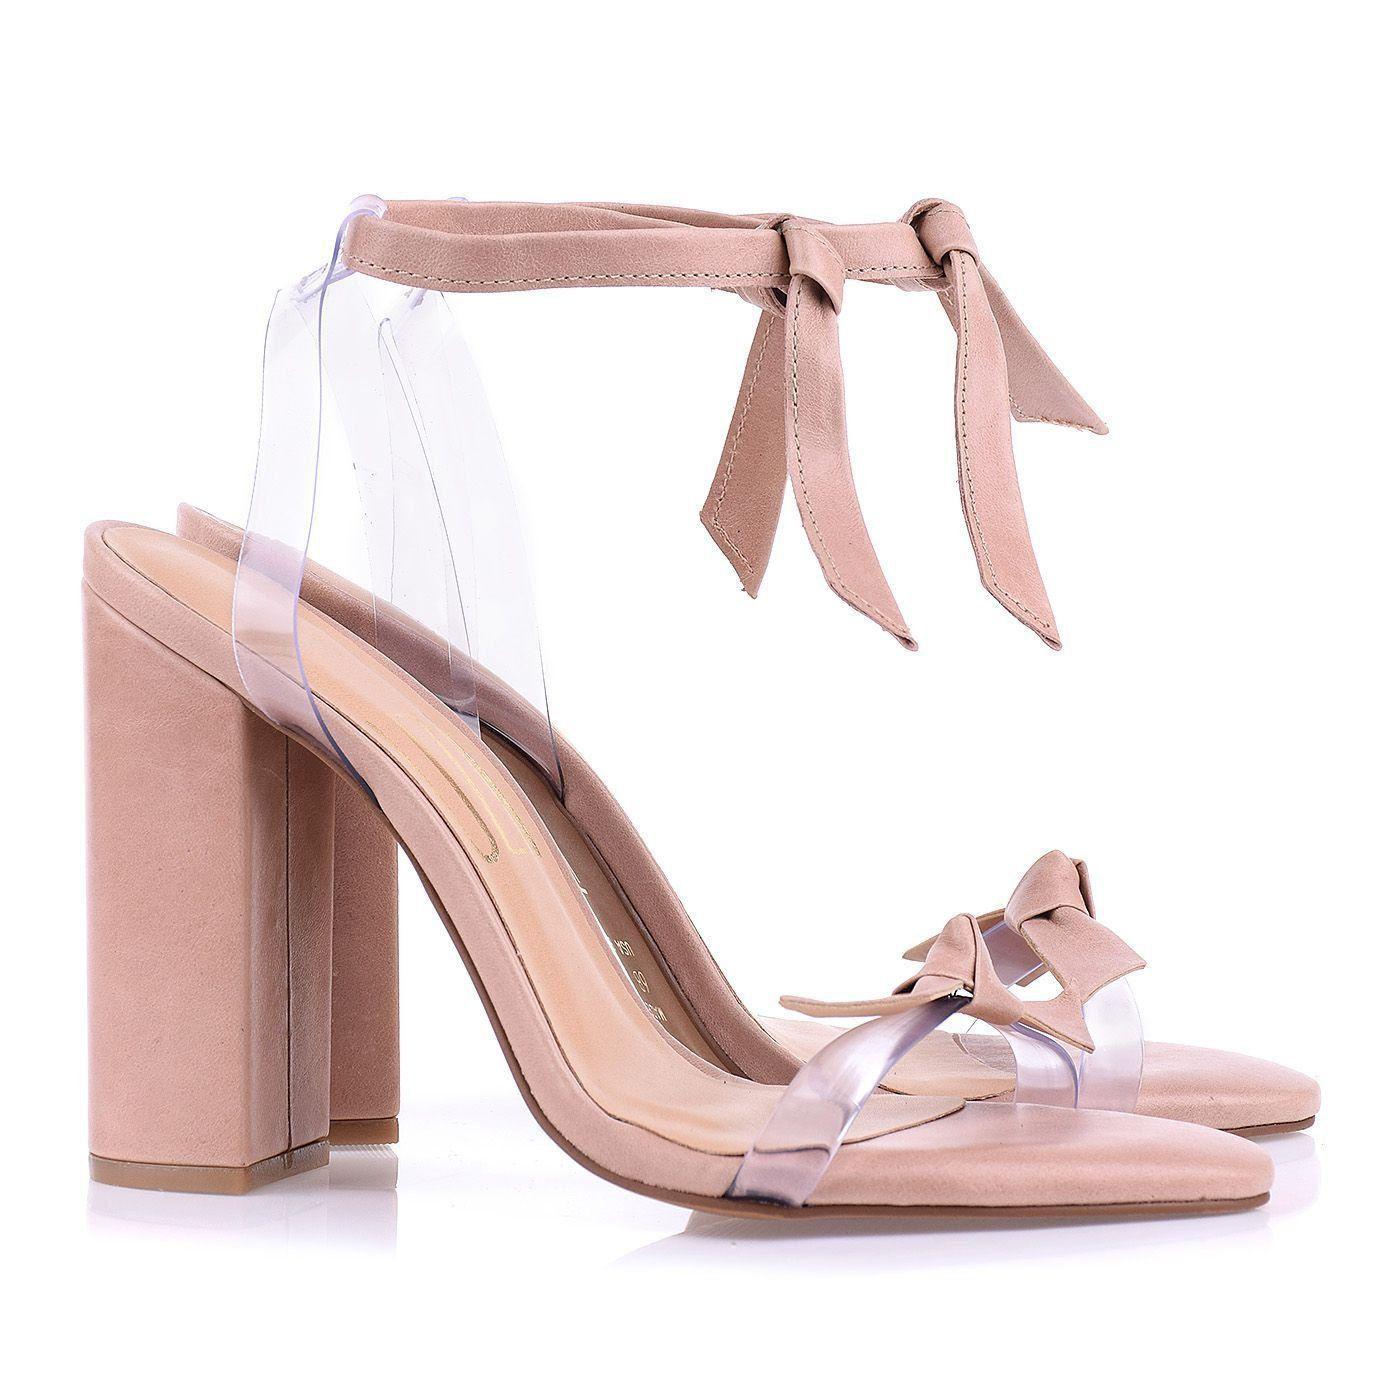 Sandália Salto Alto Lace Up Nude/Vinil Cristal